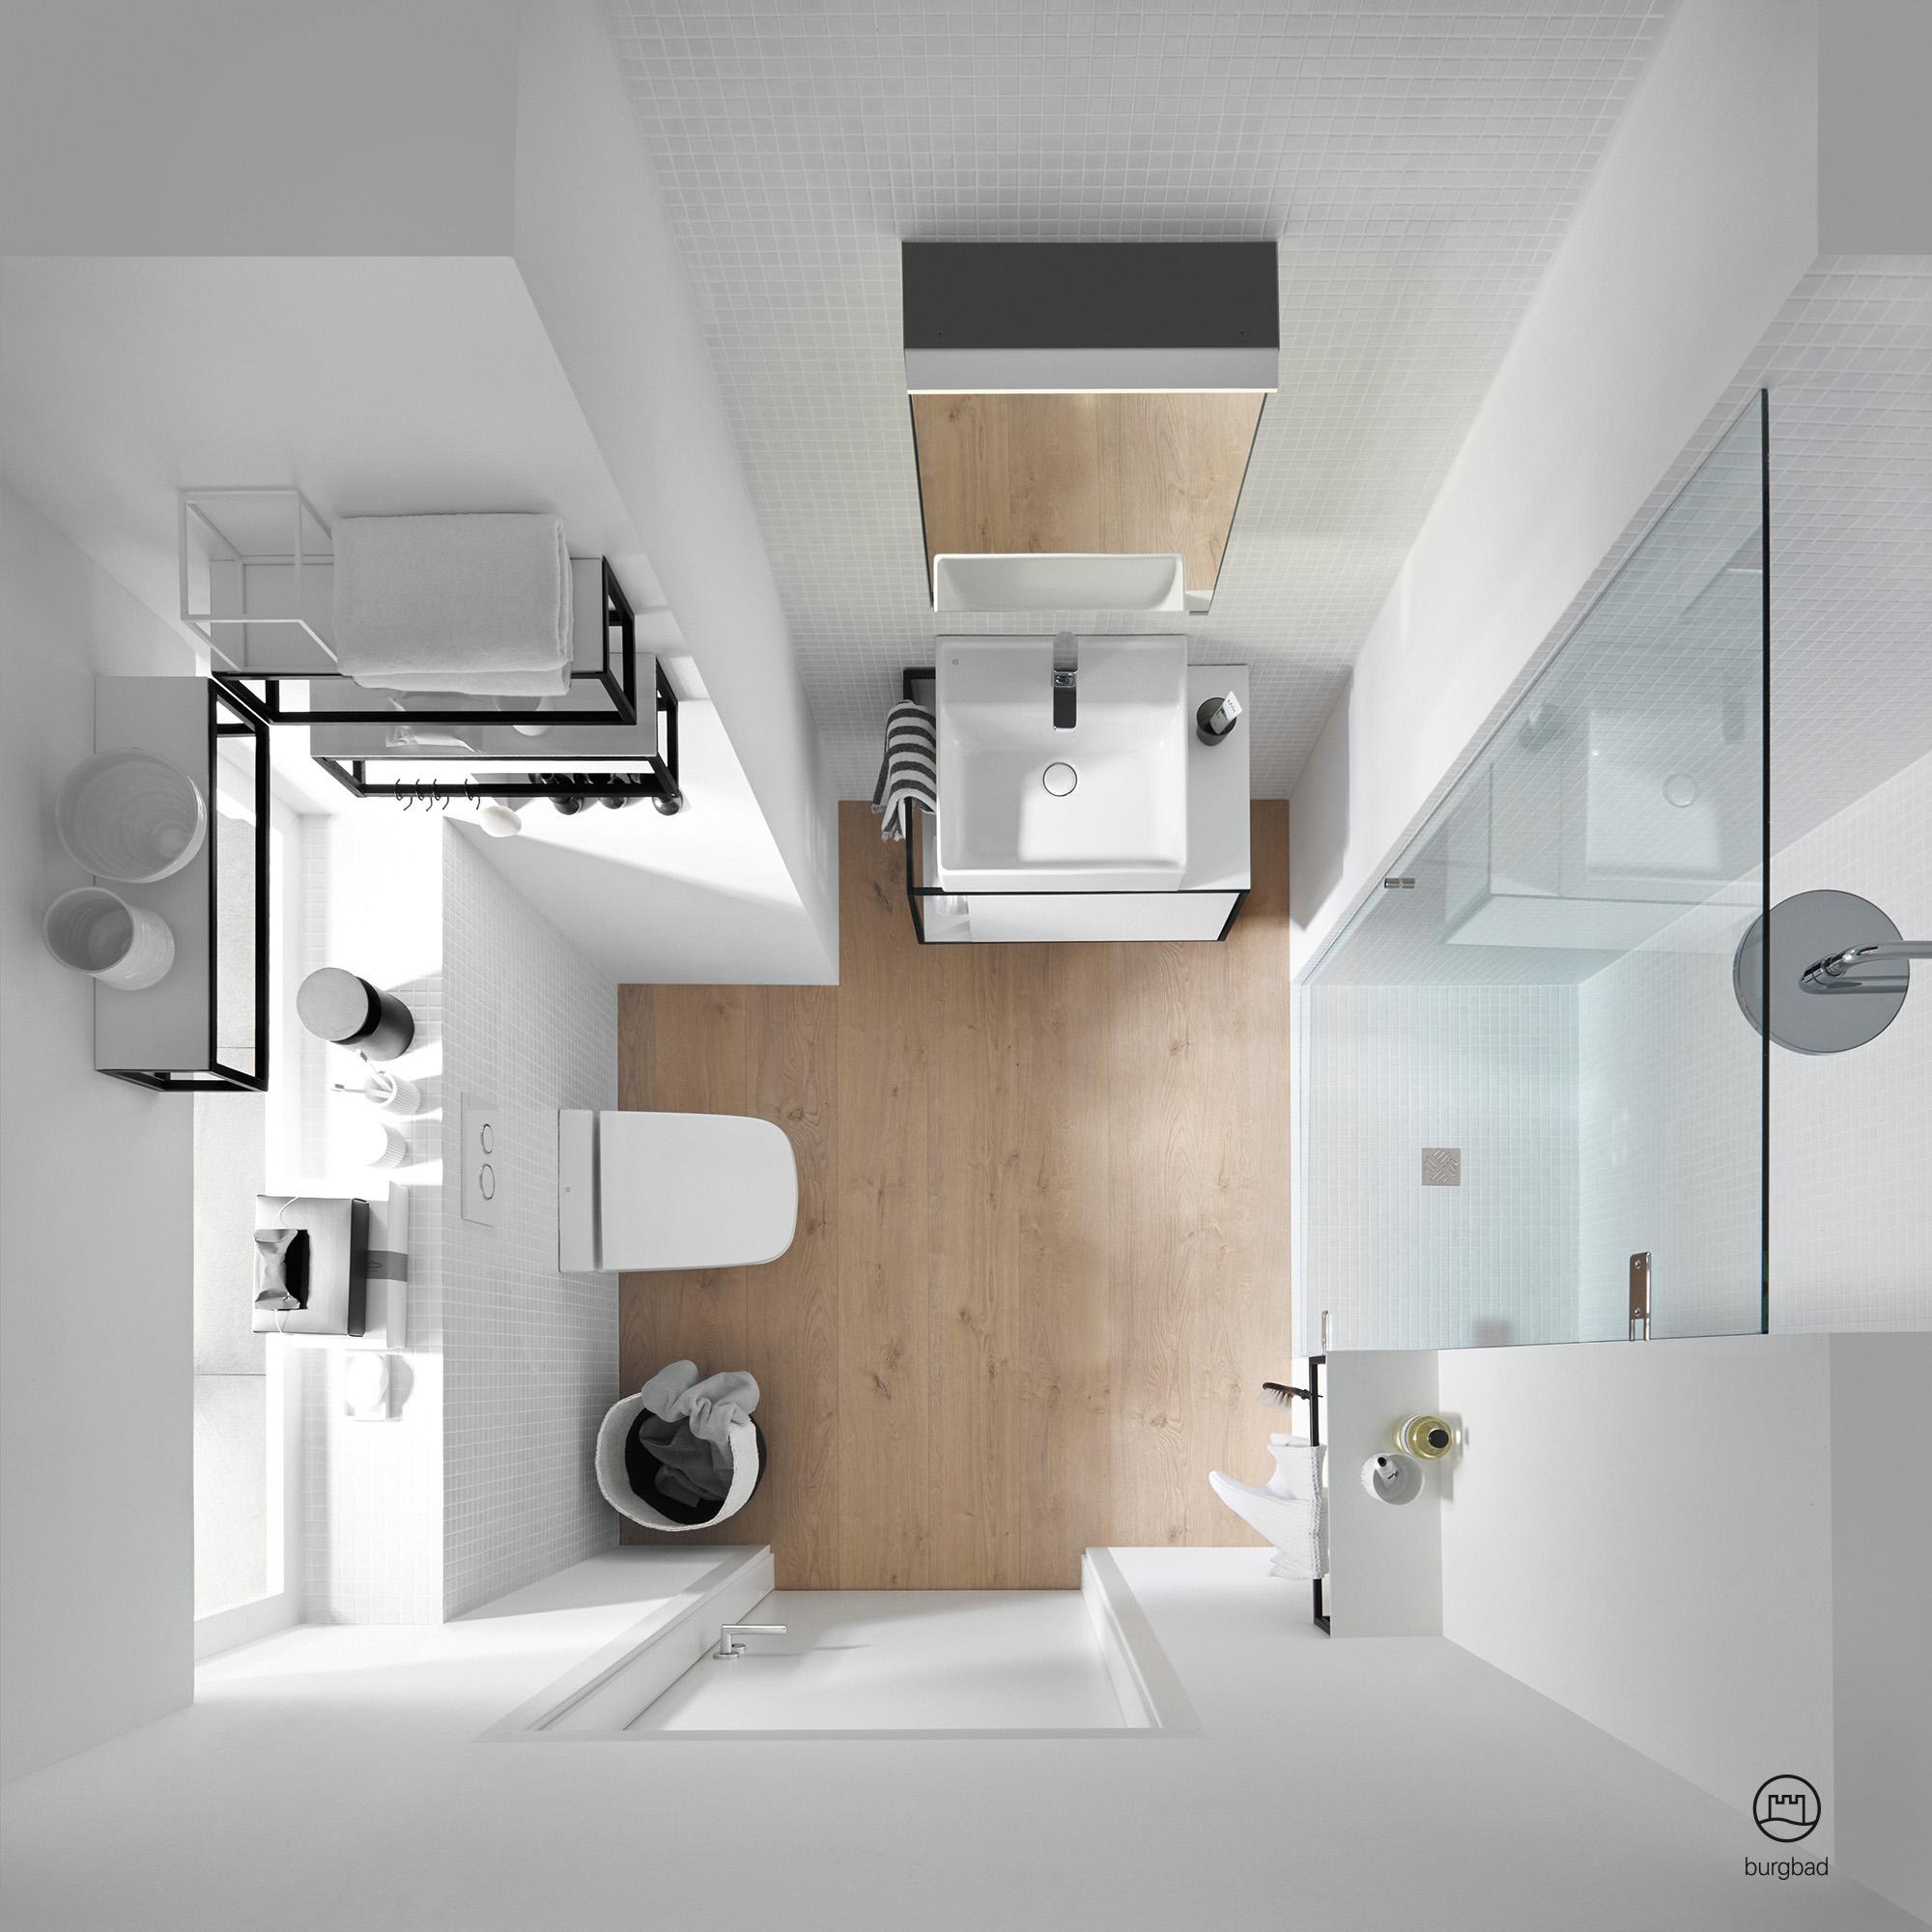 Badezimmer grundriss bilder ideen couchstyle for Badezimmer ideen waschtisch